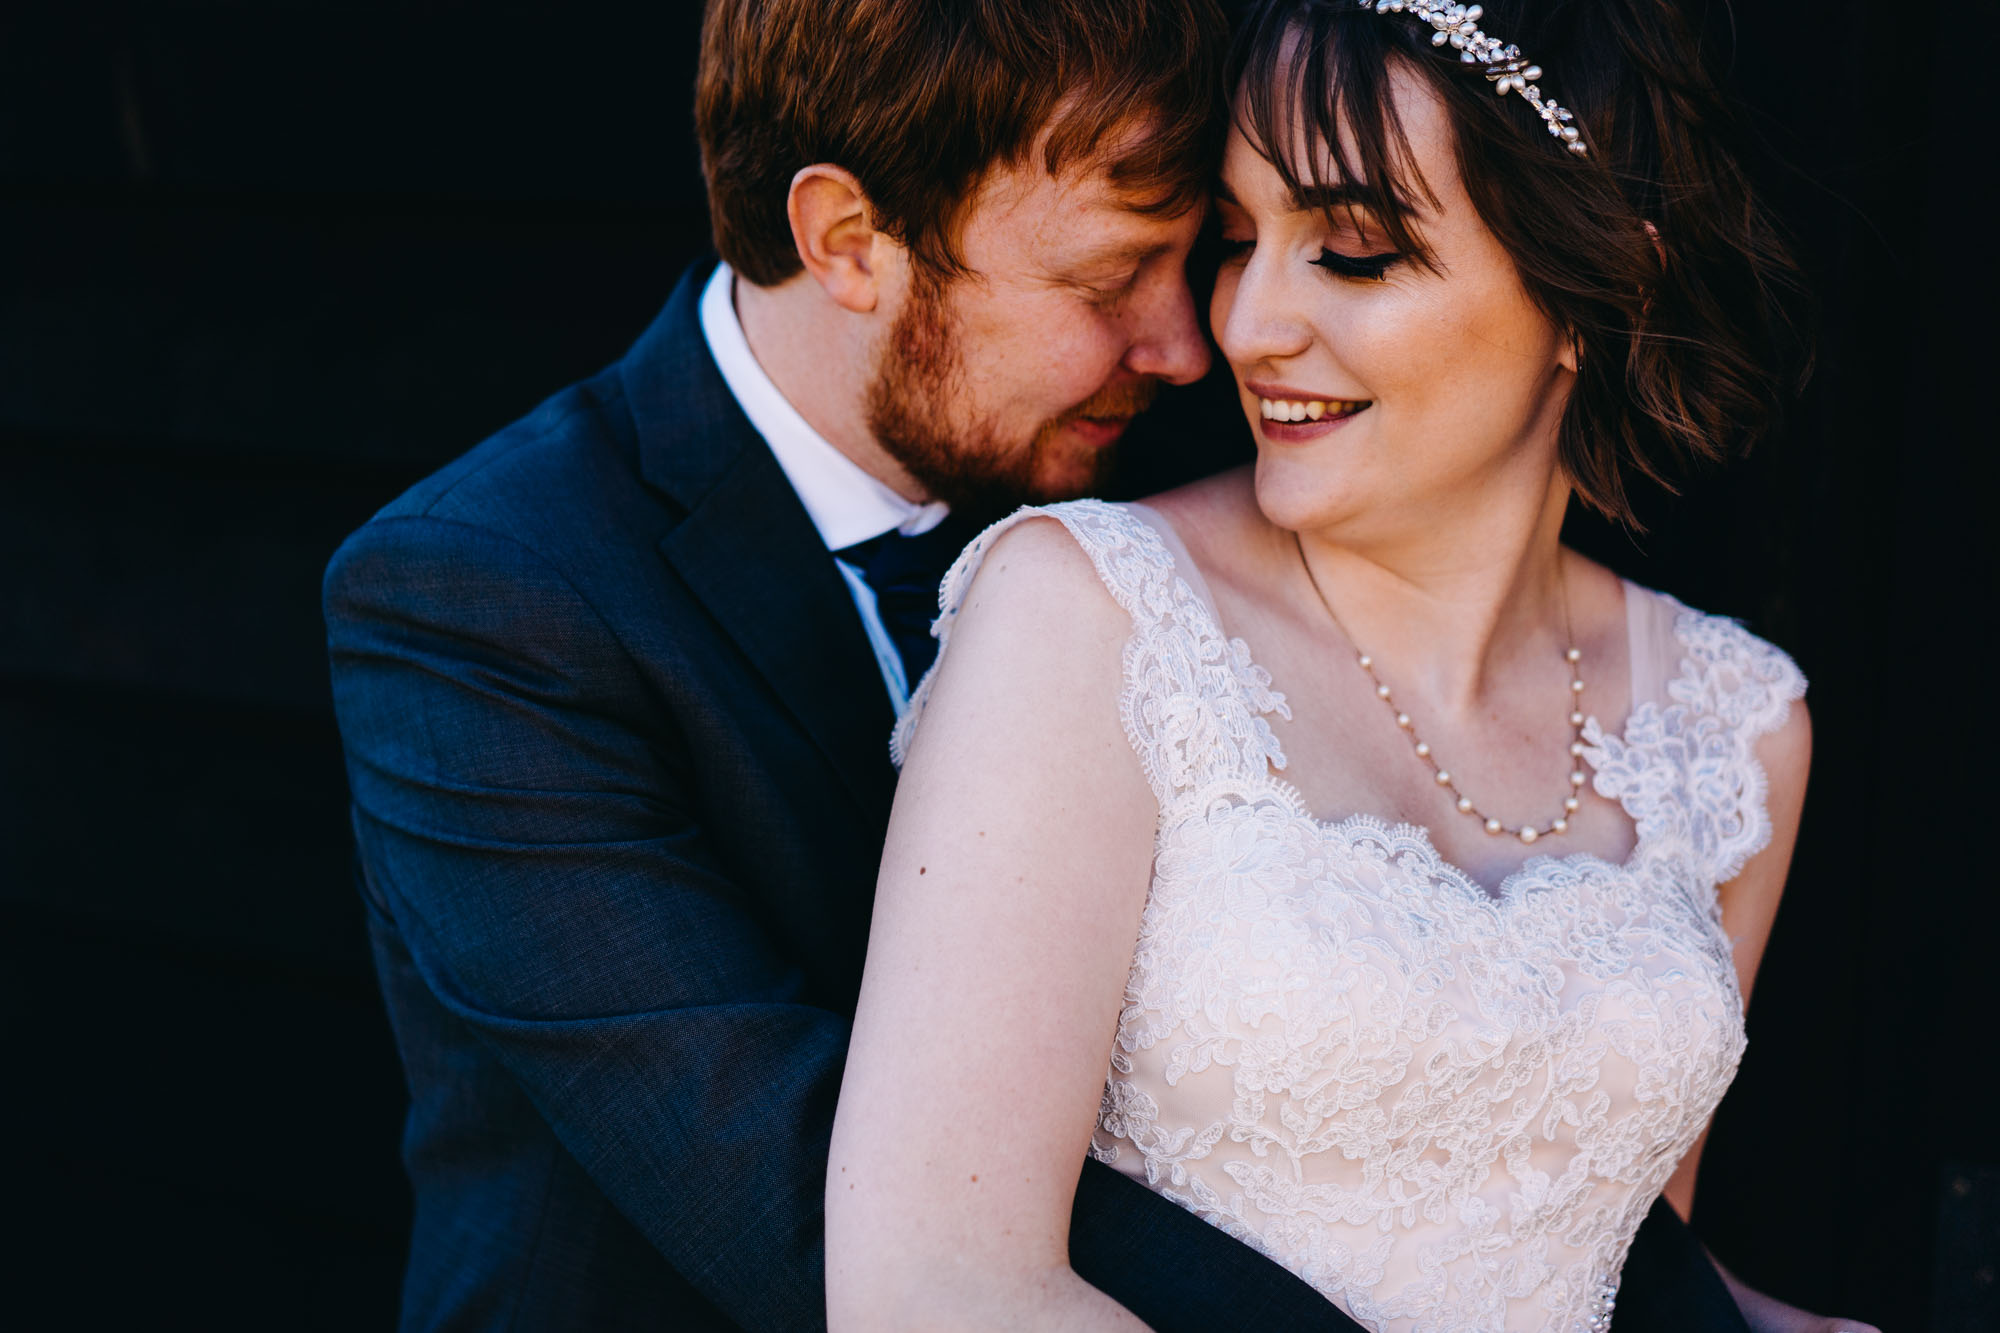 wedding-at-dodford-manor-59